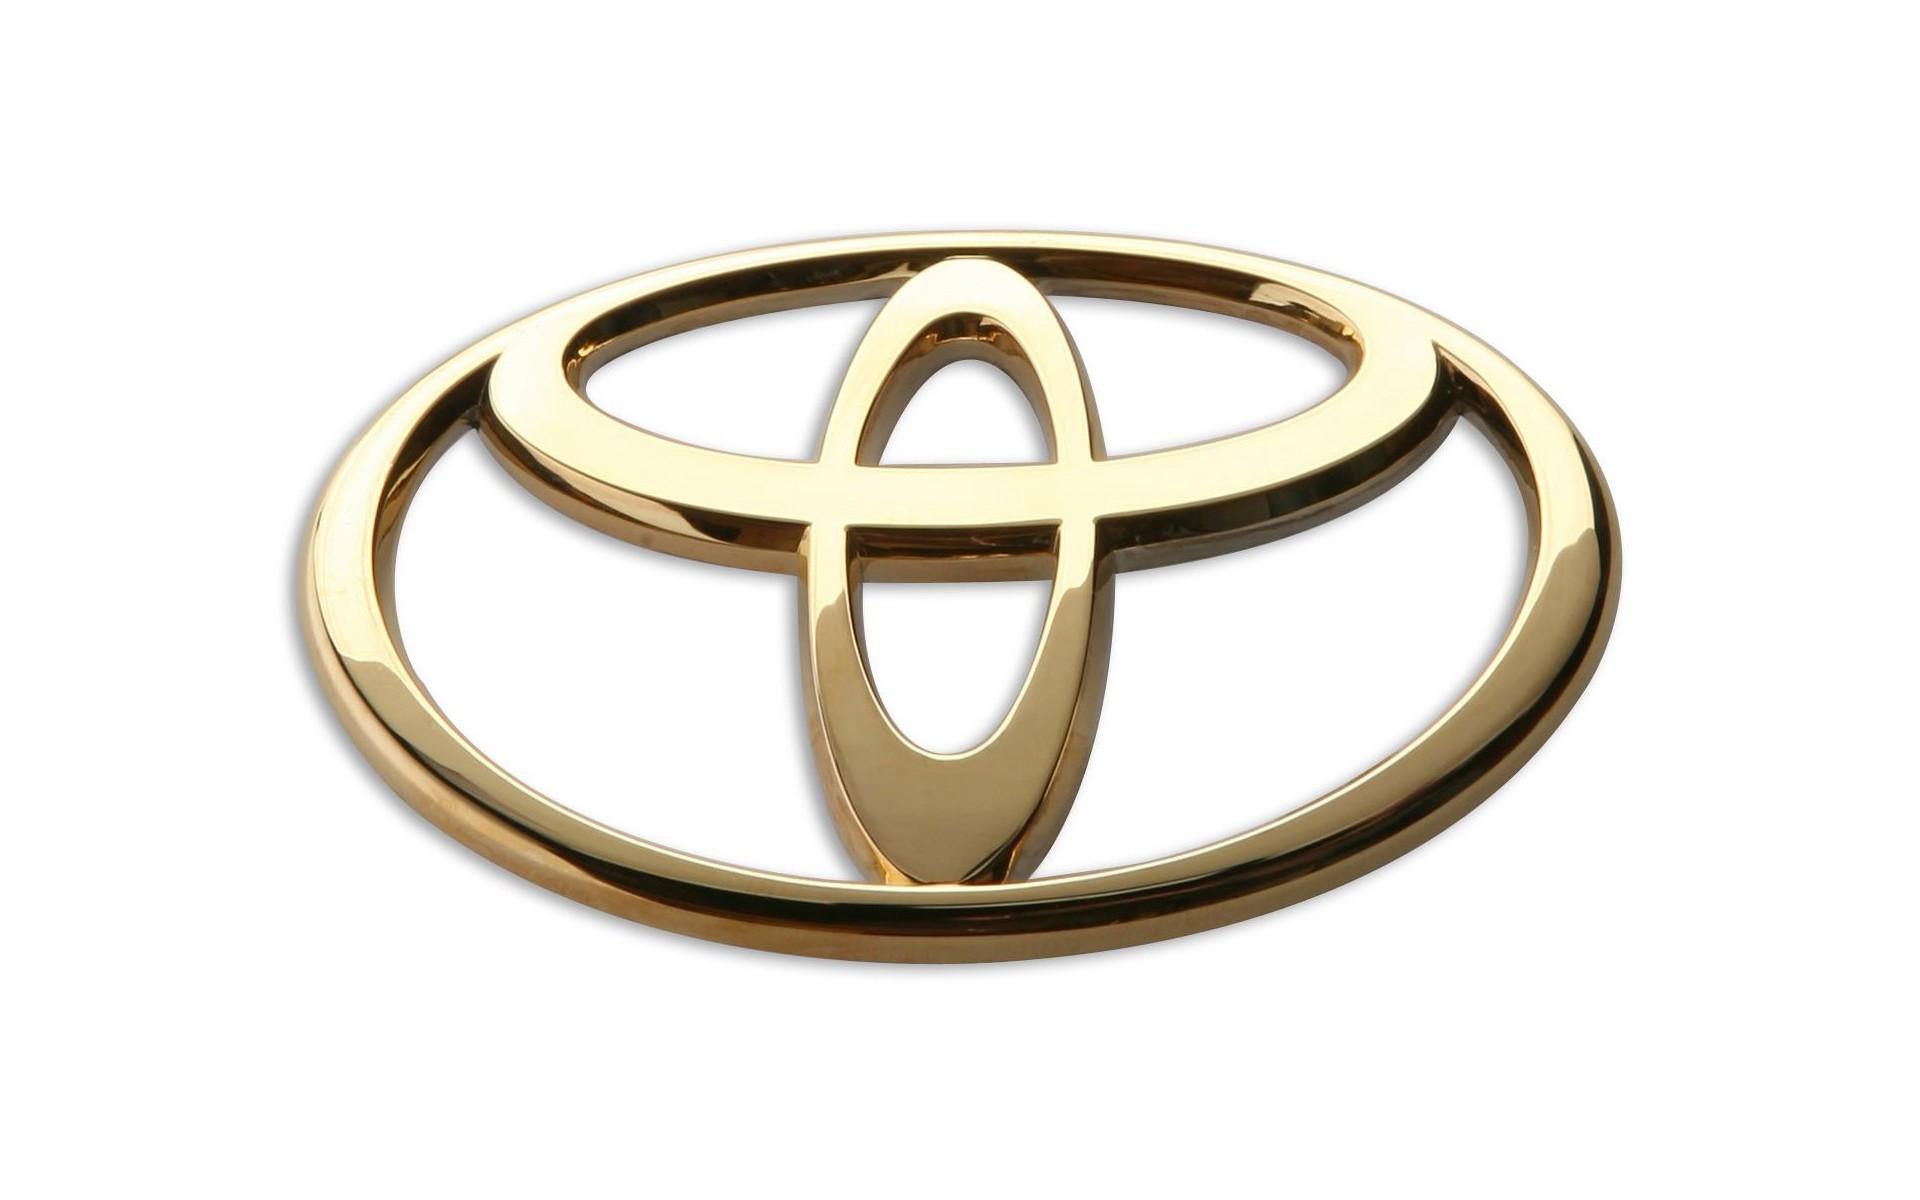 Toyota объявила о росте доли бренда на российском рынке